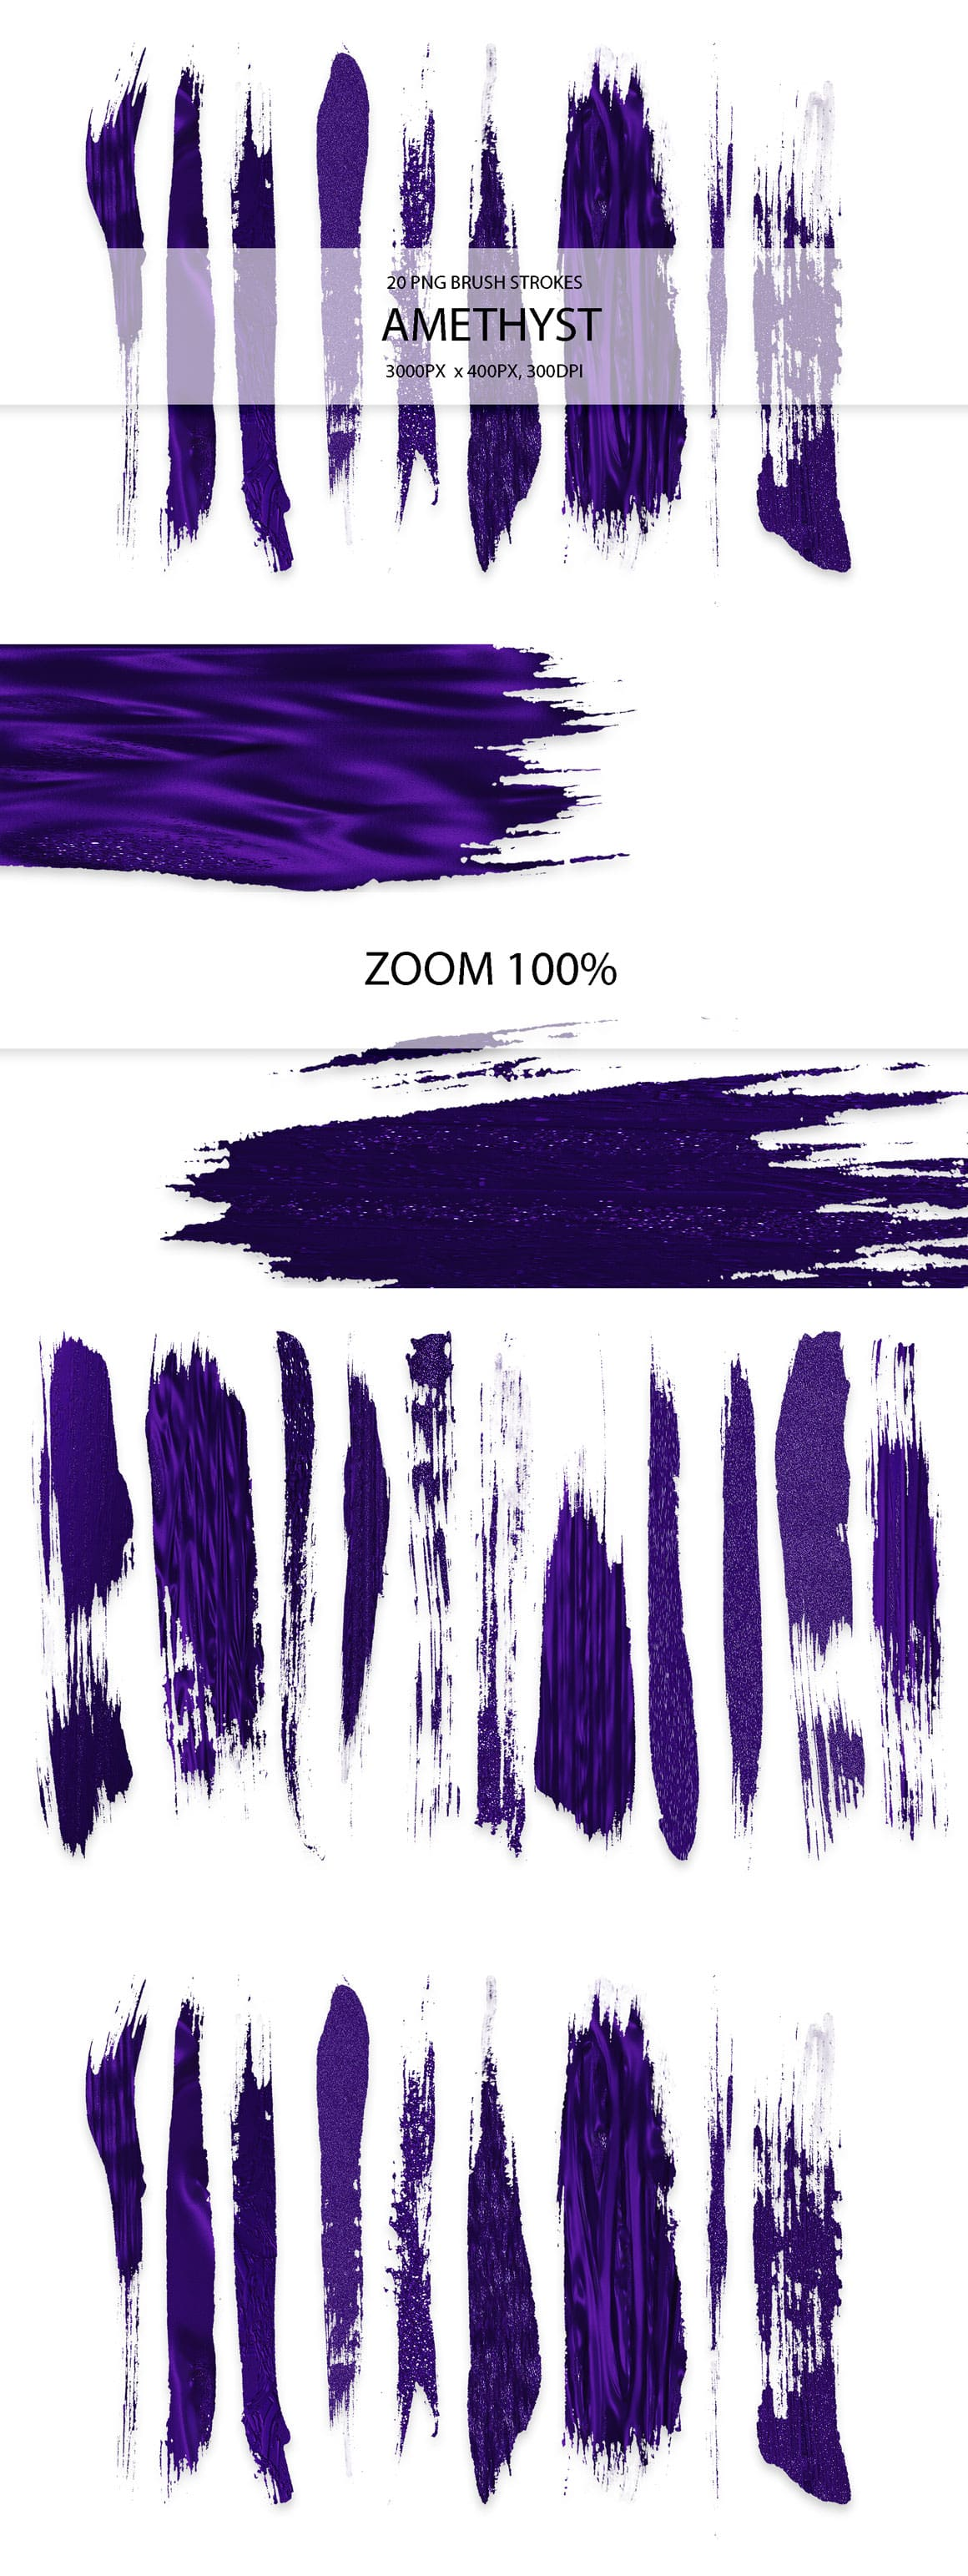 829 Acrylic Brush Strokes and Digital Brush Strokes